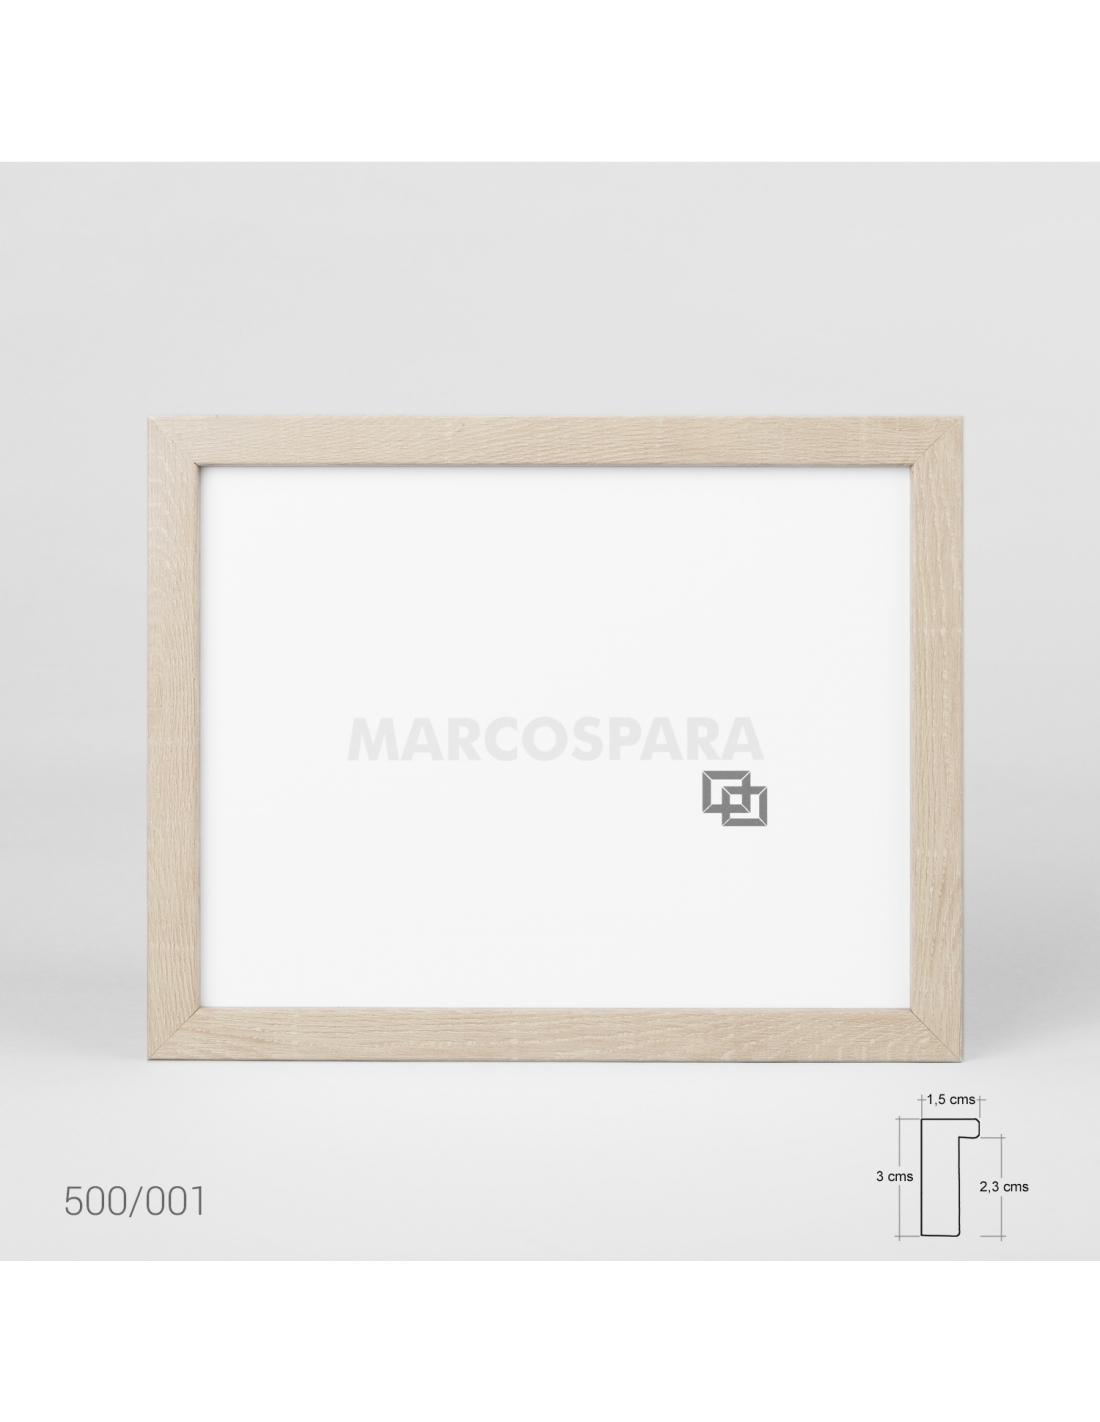 Marcos de madera para posters M500